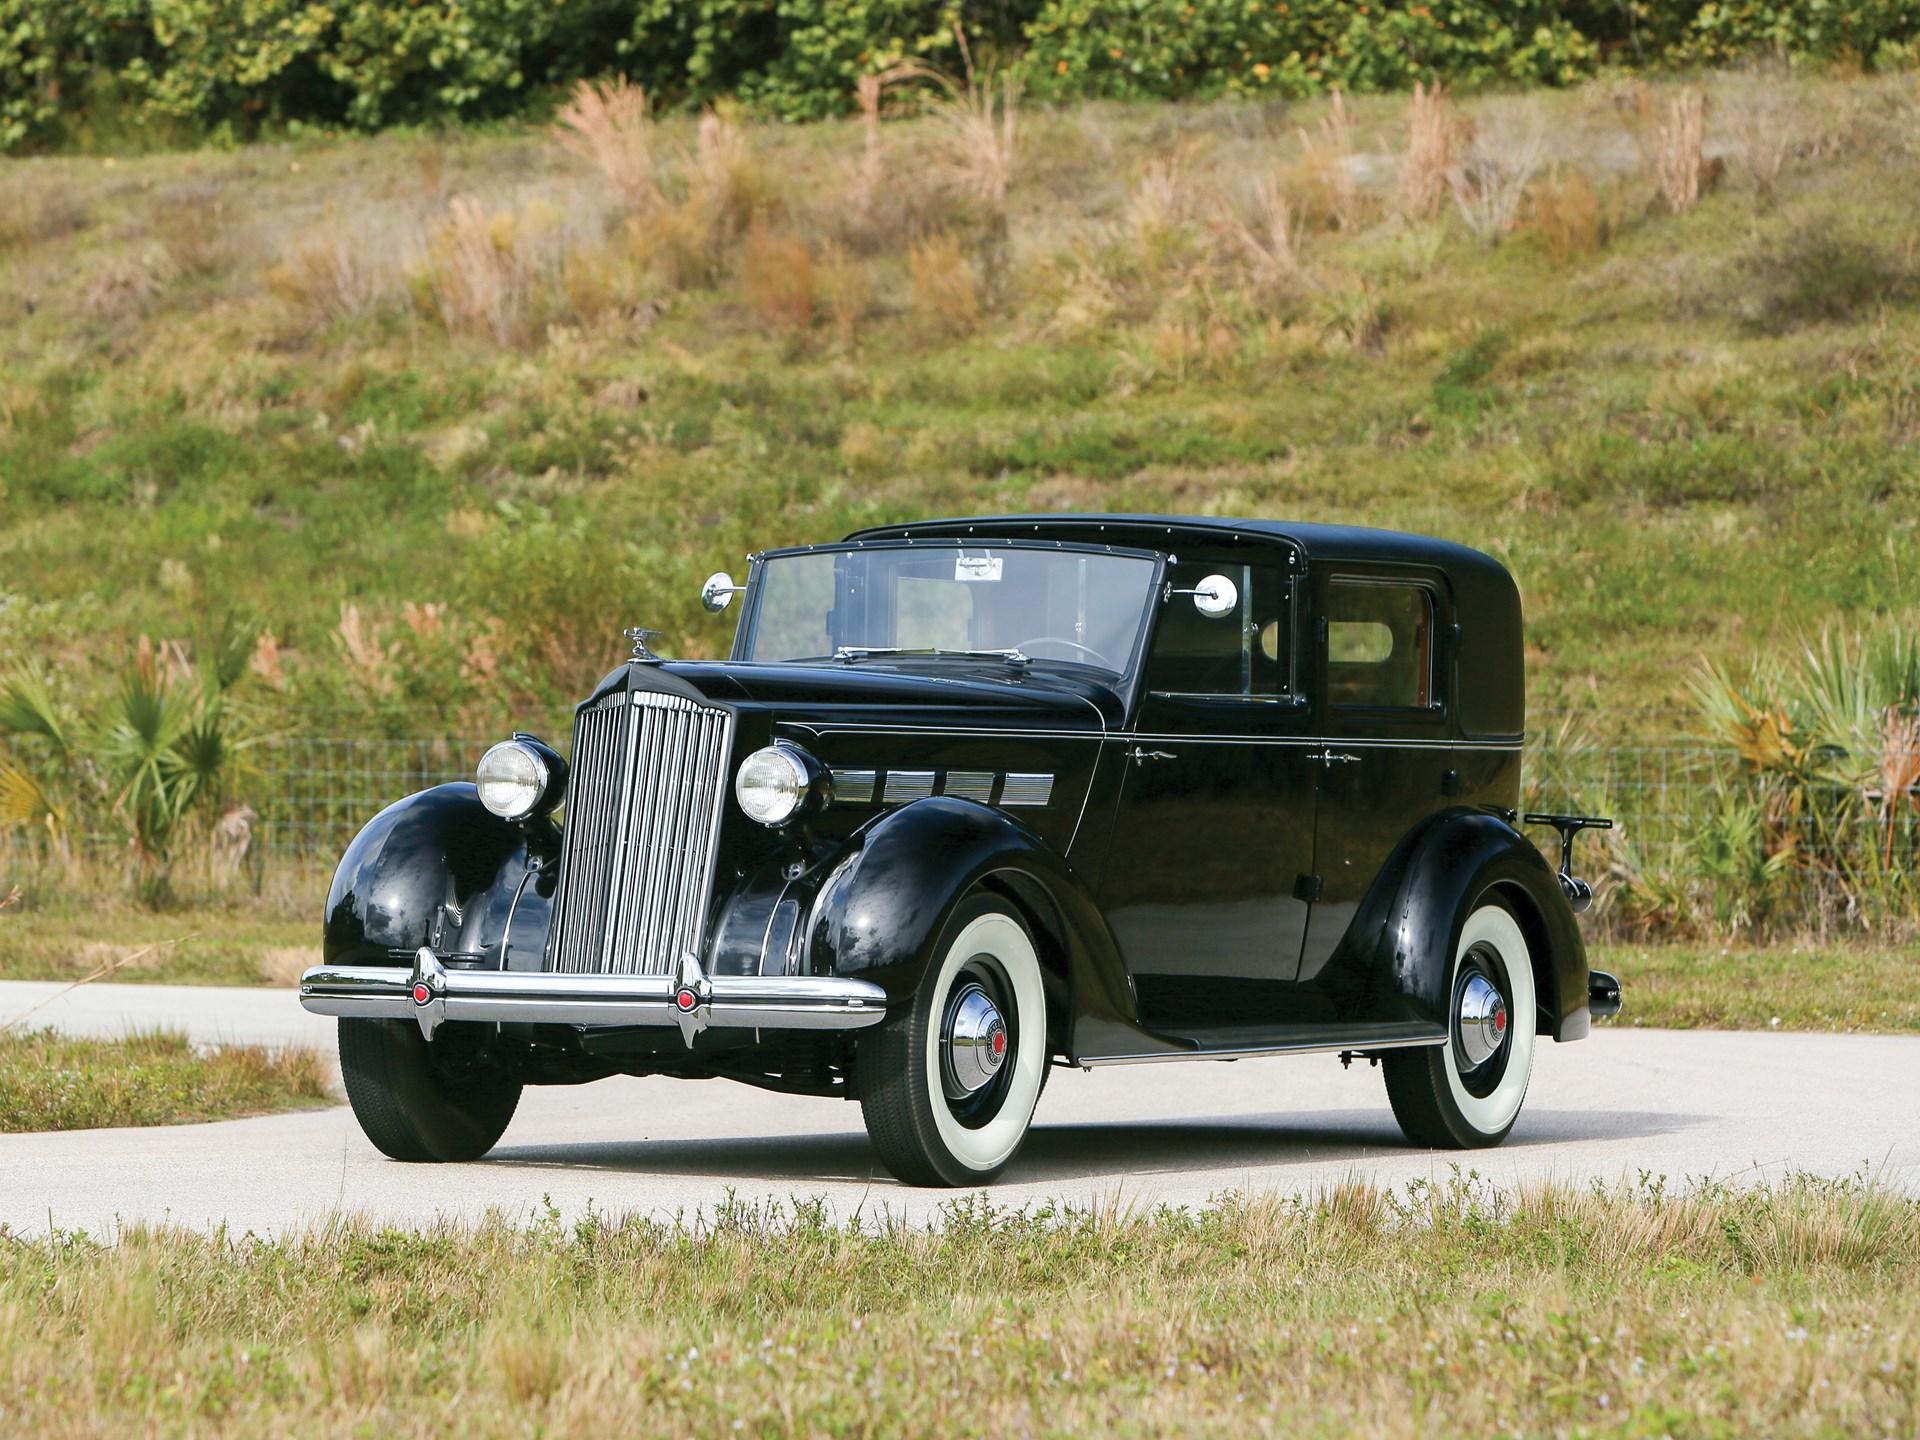 1937 Packard One Twenty All-Weather Cabriolet by Rollston